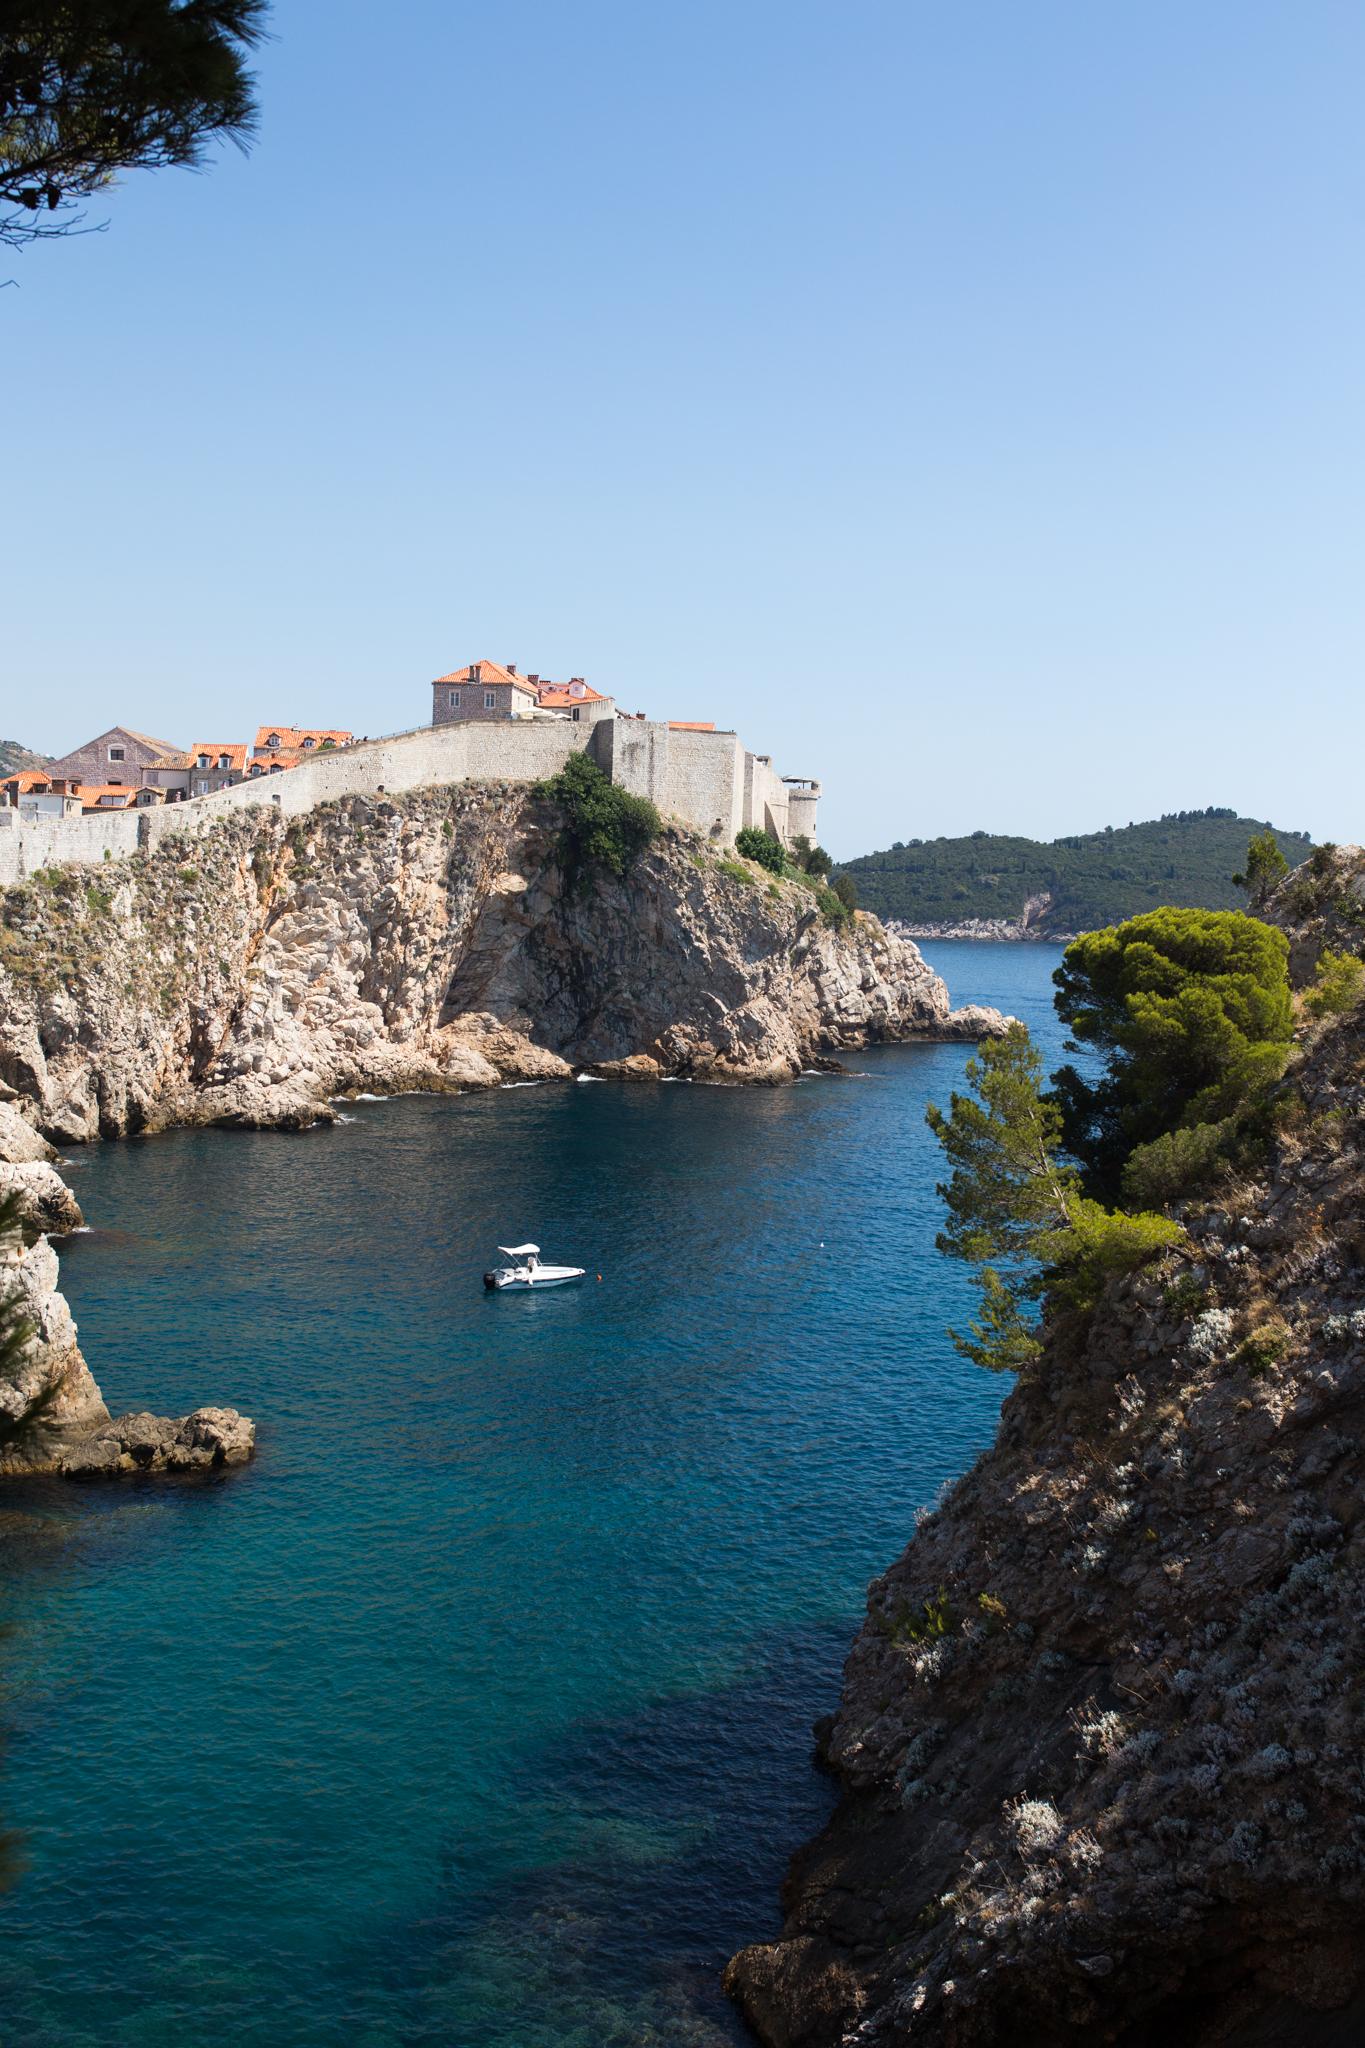 dubrovnik-croatia-dubrovnik hidden spots-dubrovnik beaches-cliff diving in dubrovnik-cliff diving in croatia-arose travels-alina mendoza-9606.jpg